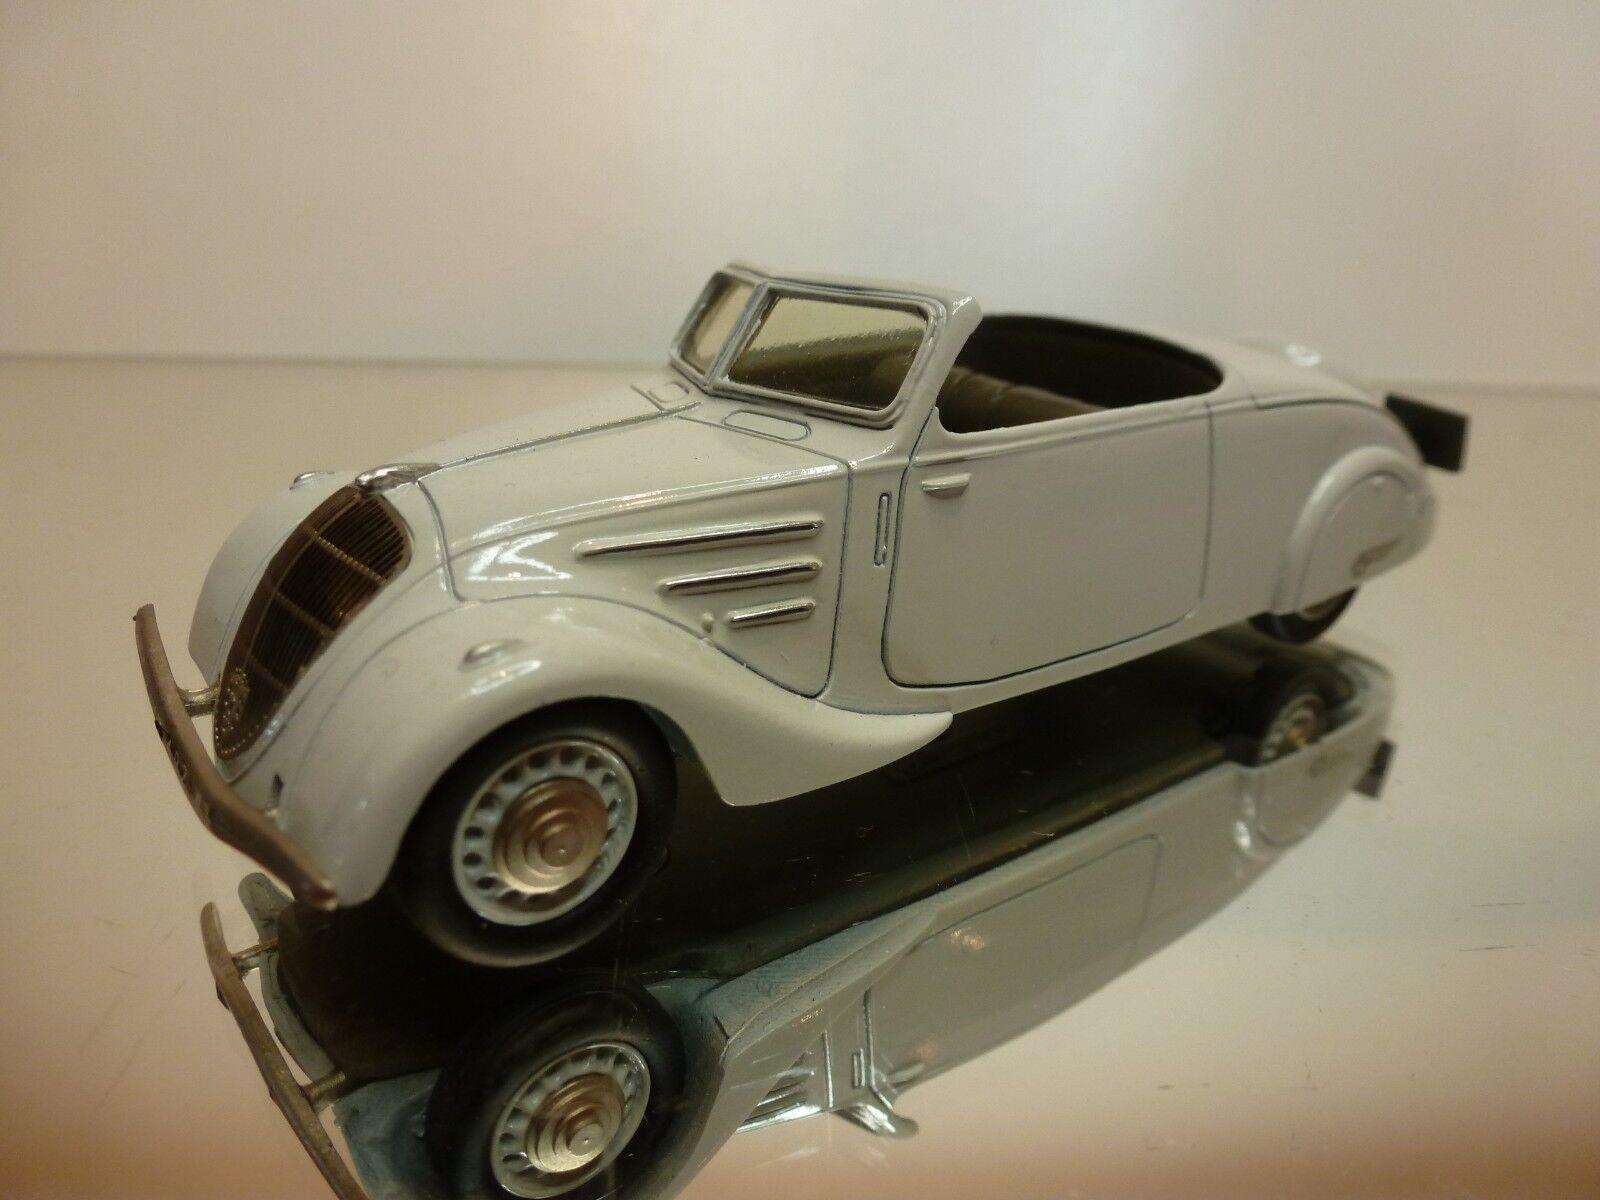 ELYSEE 532 PEUGEOT 402 ECLIPSE 1936 - blanc 1 43 - EXCELLENT - 45 40